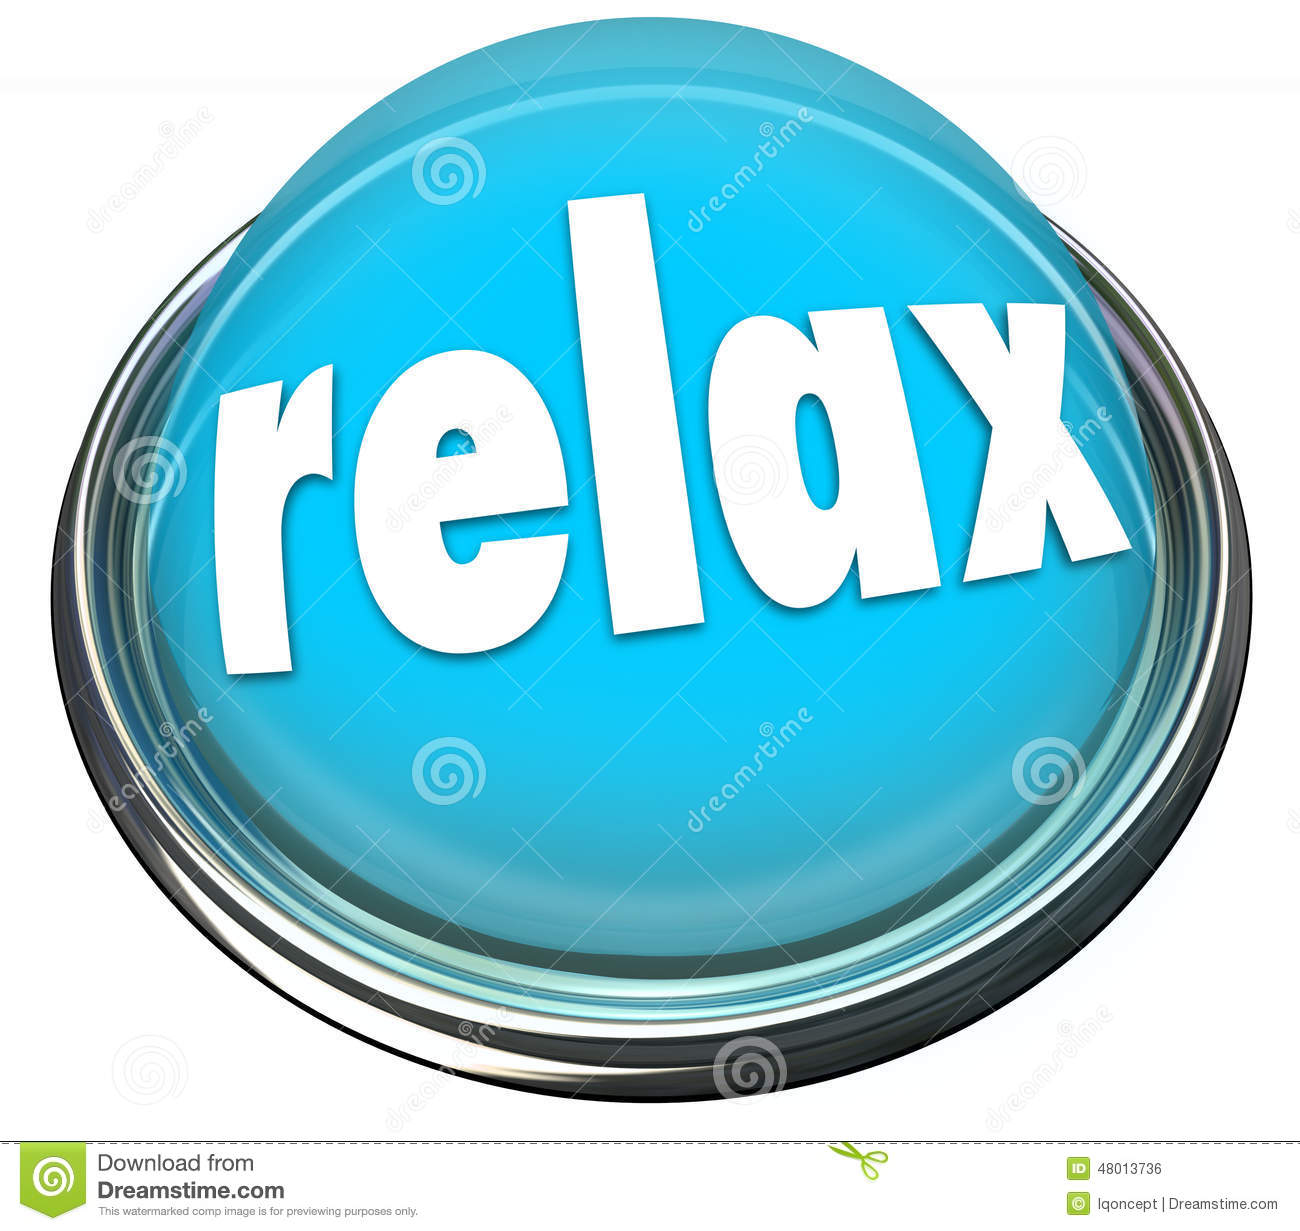 Relax clipart calm #4